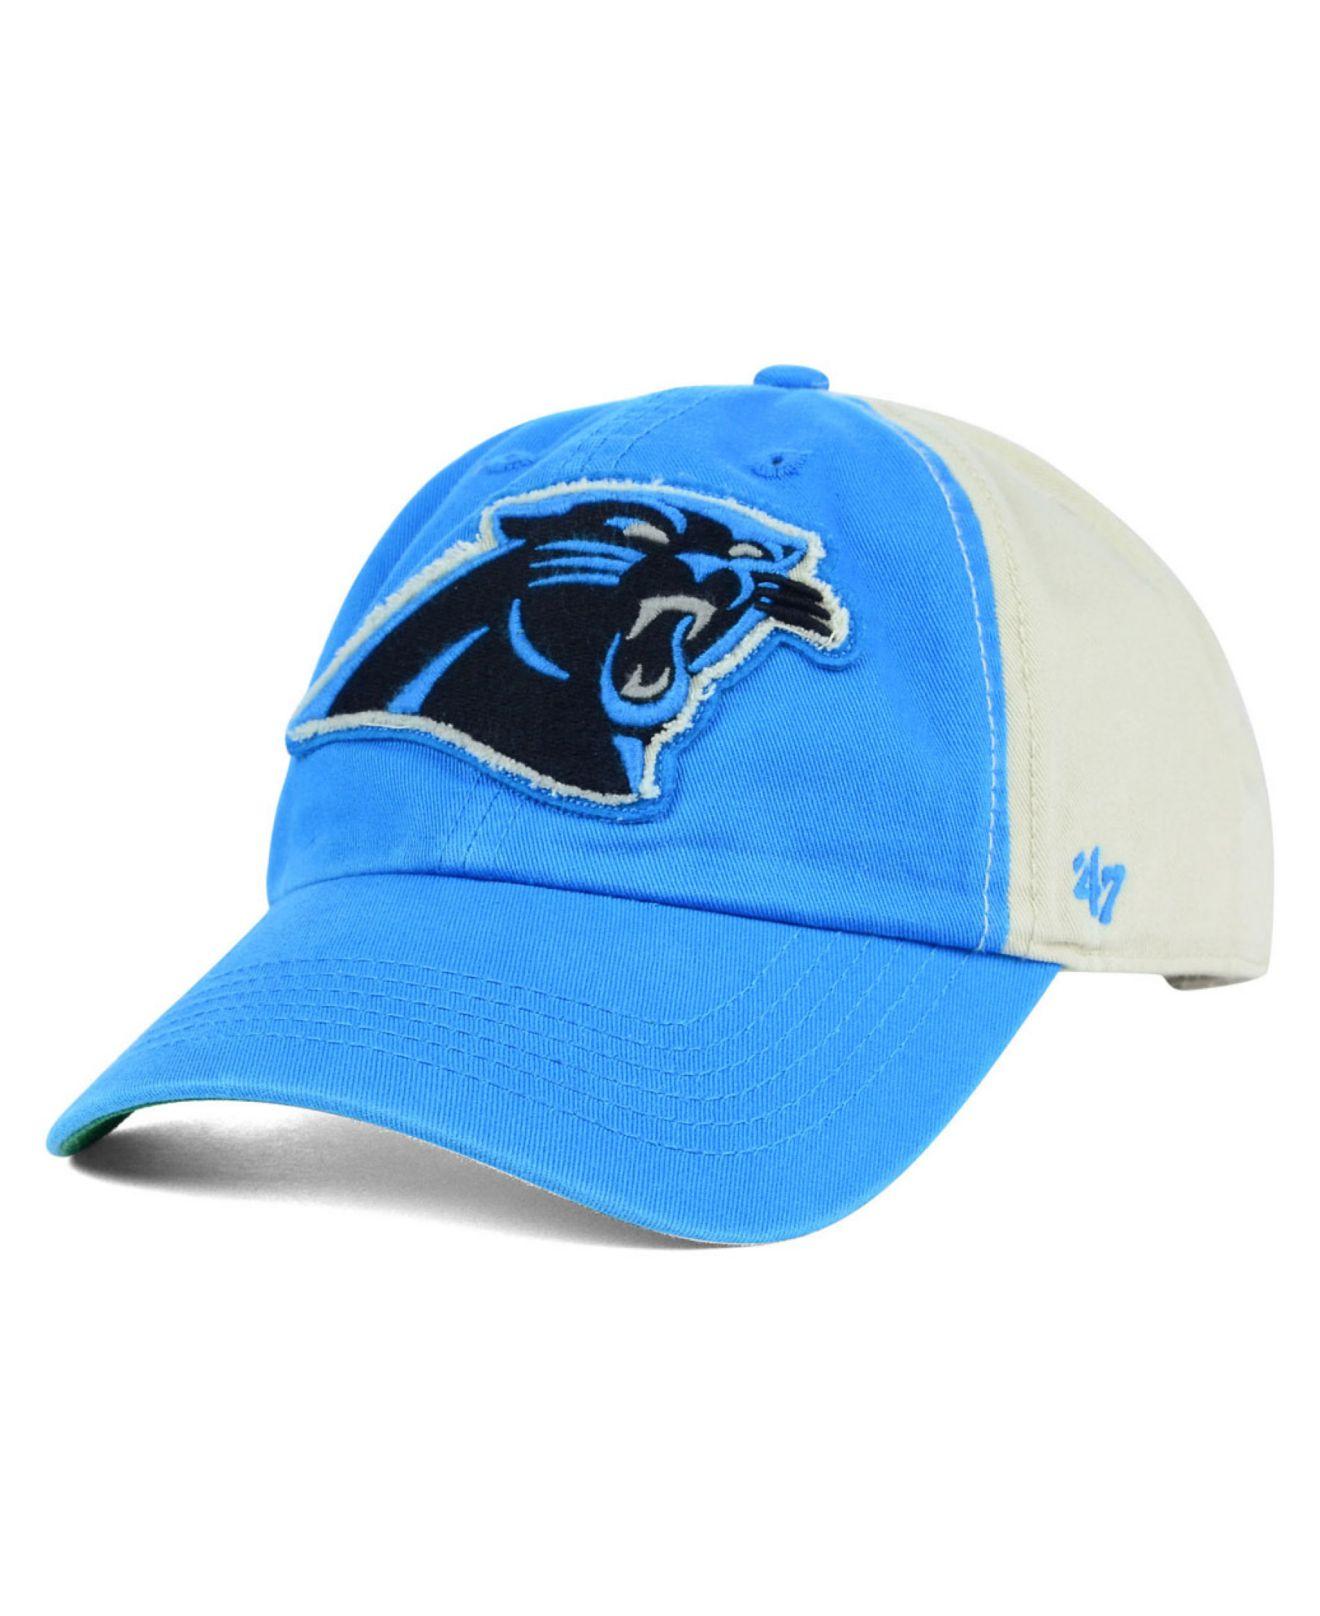 7bb758986d4 Lyst - 47 Brand Carolina Panthers Nfl Derby Clean Up Cap in Black ...